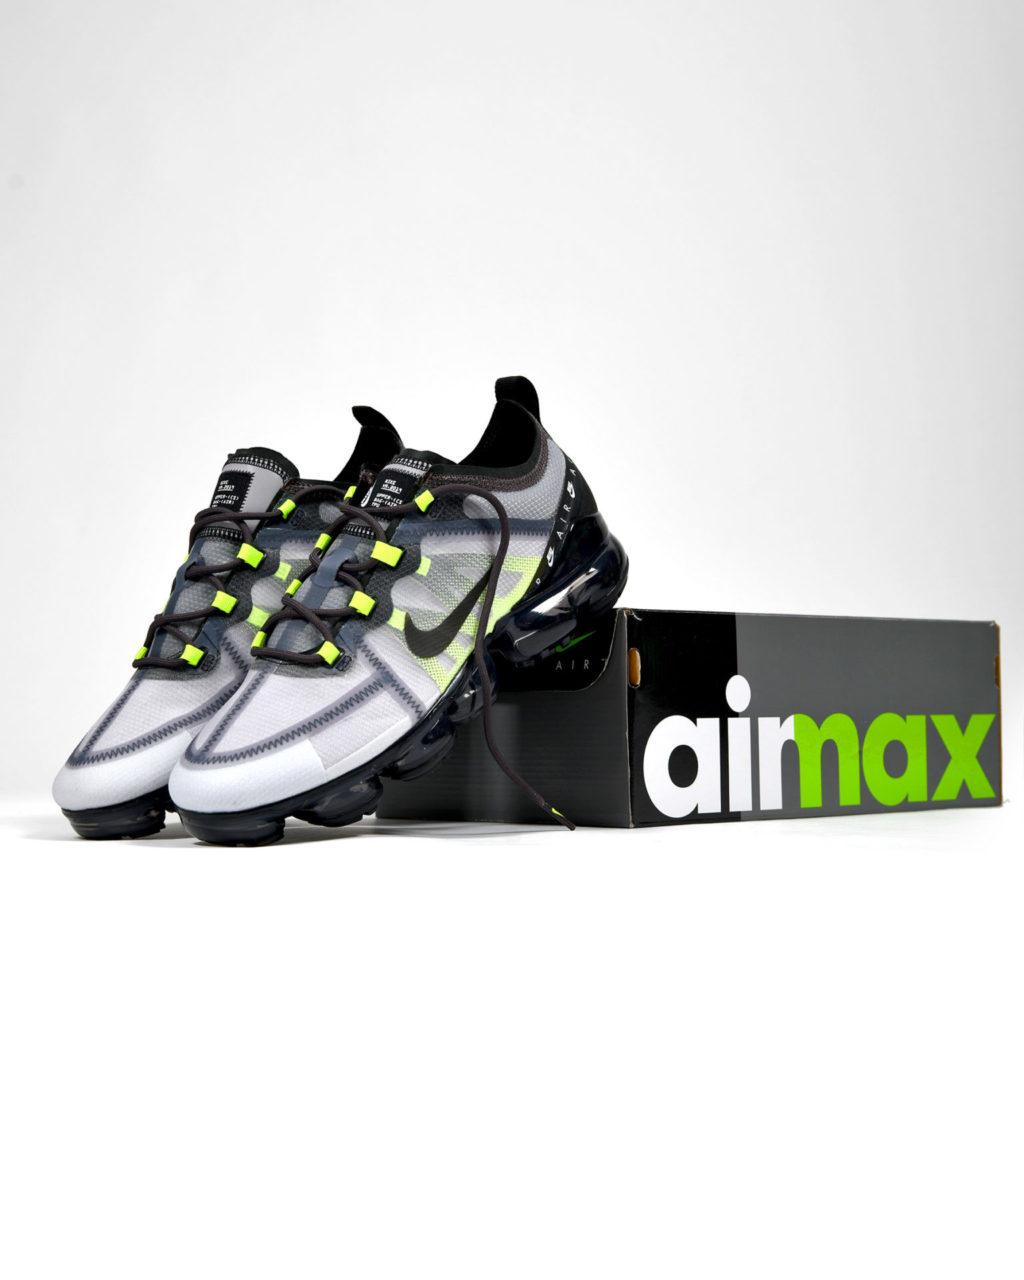 Nike Air Vapormax 2019 Neon